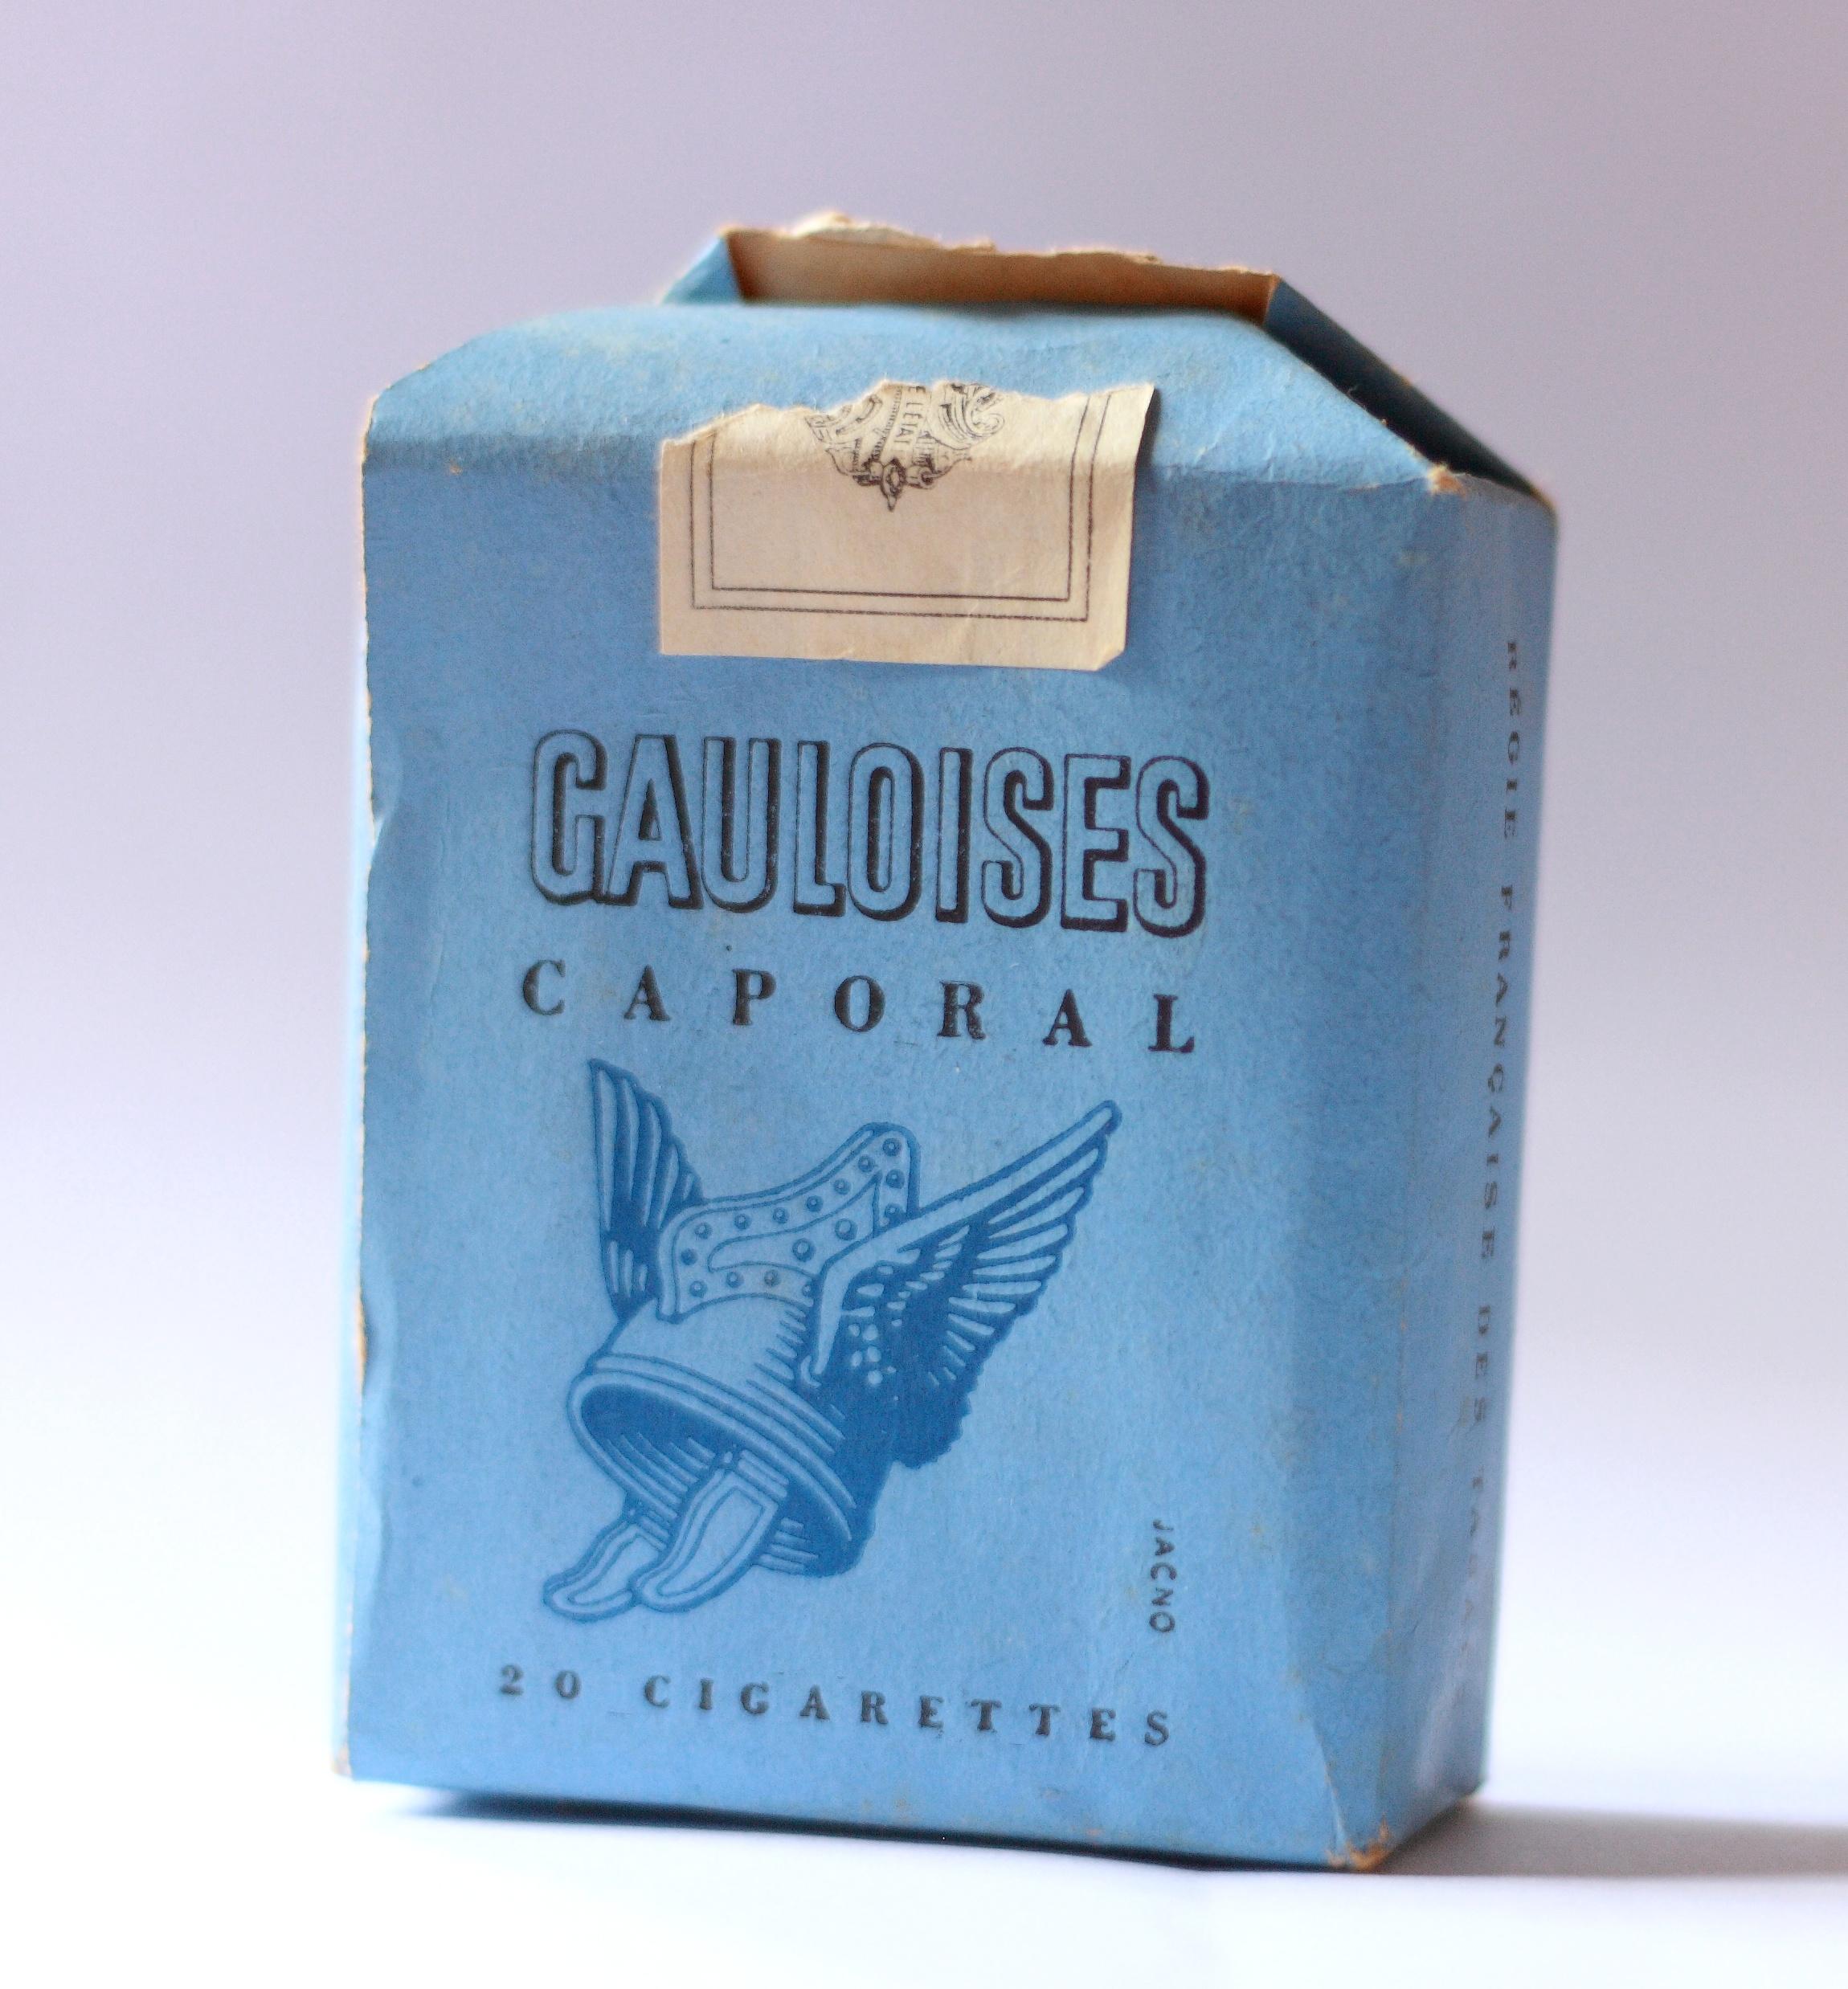 Gauloises - Wikiwand